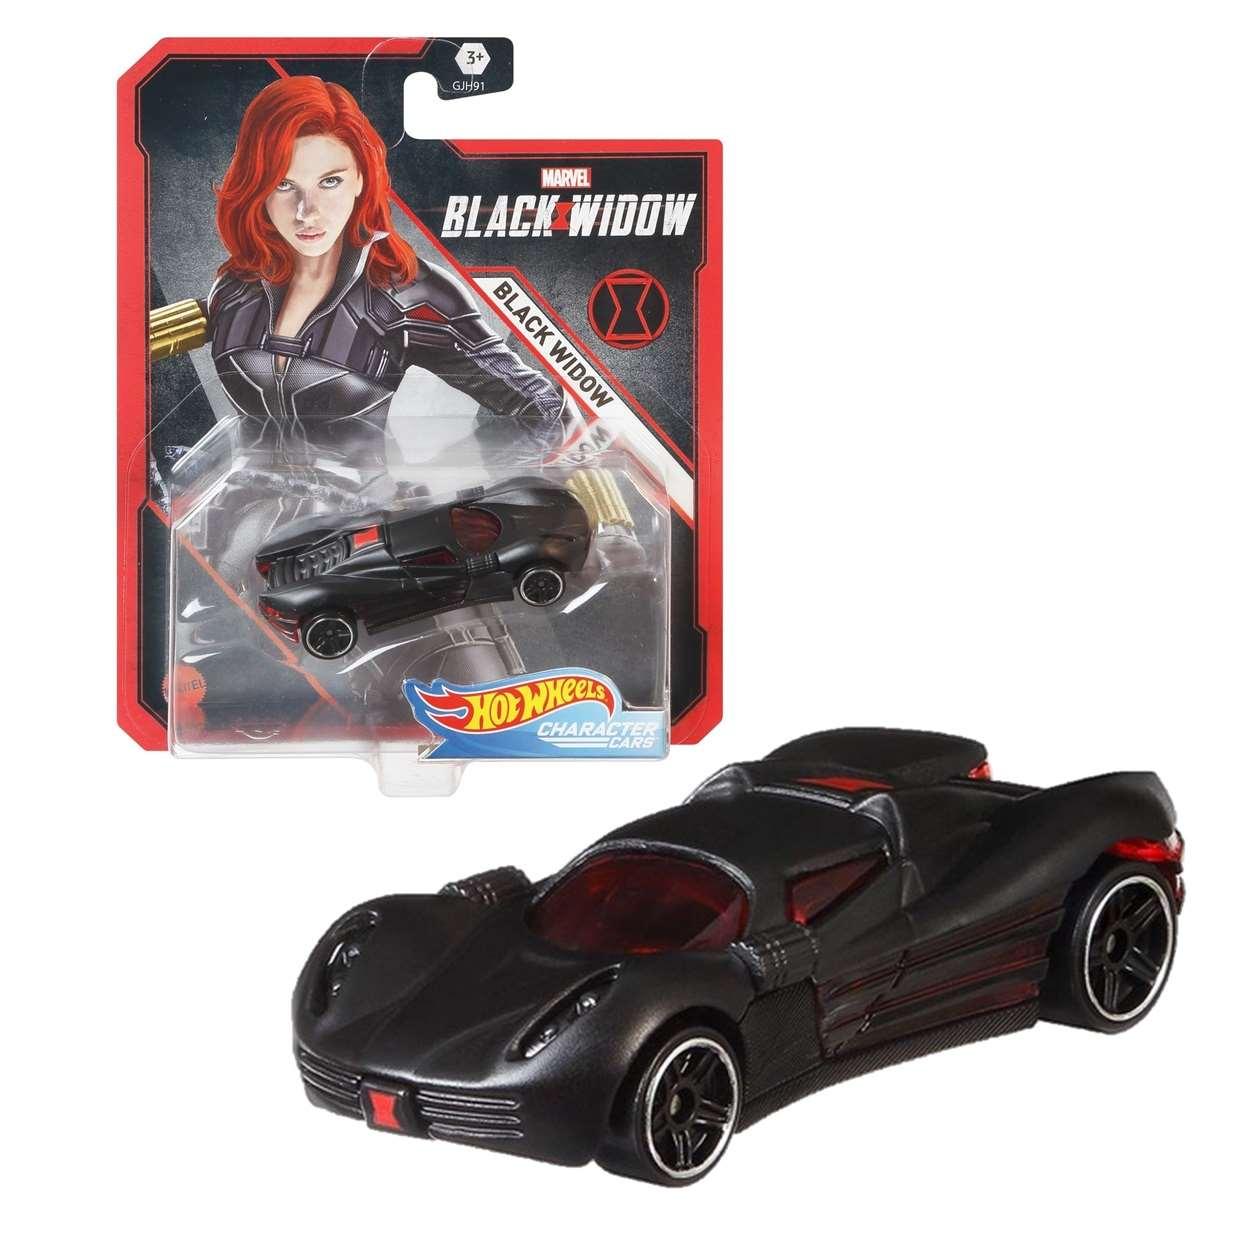 Black Widow Gjh91 Hot Wheels Marvel Character Cars